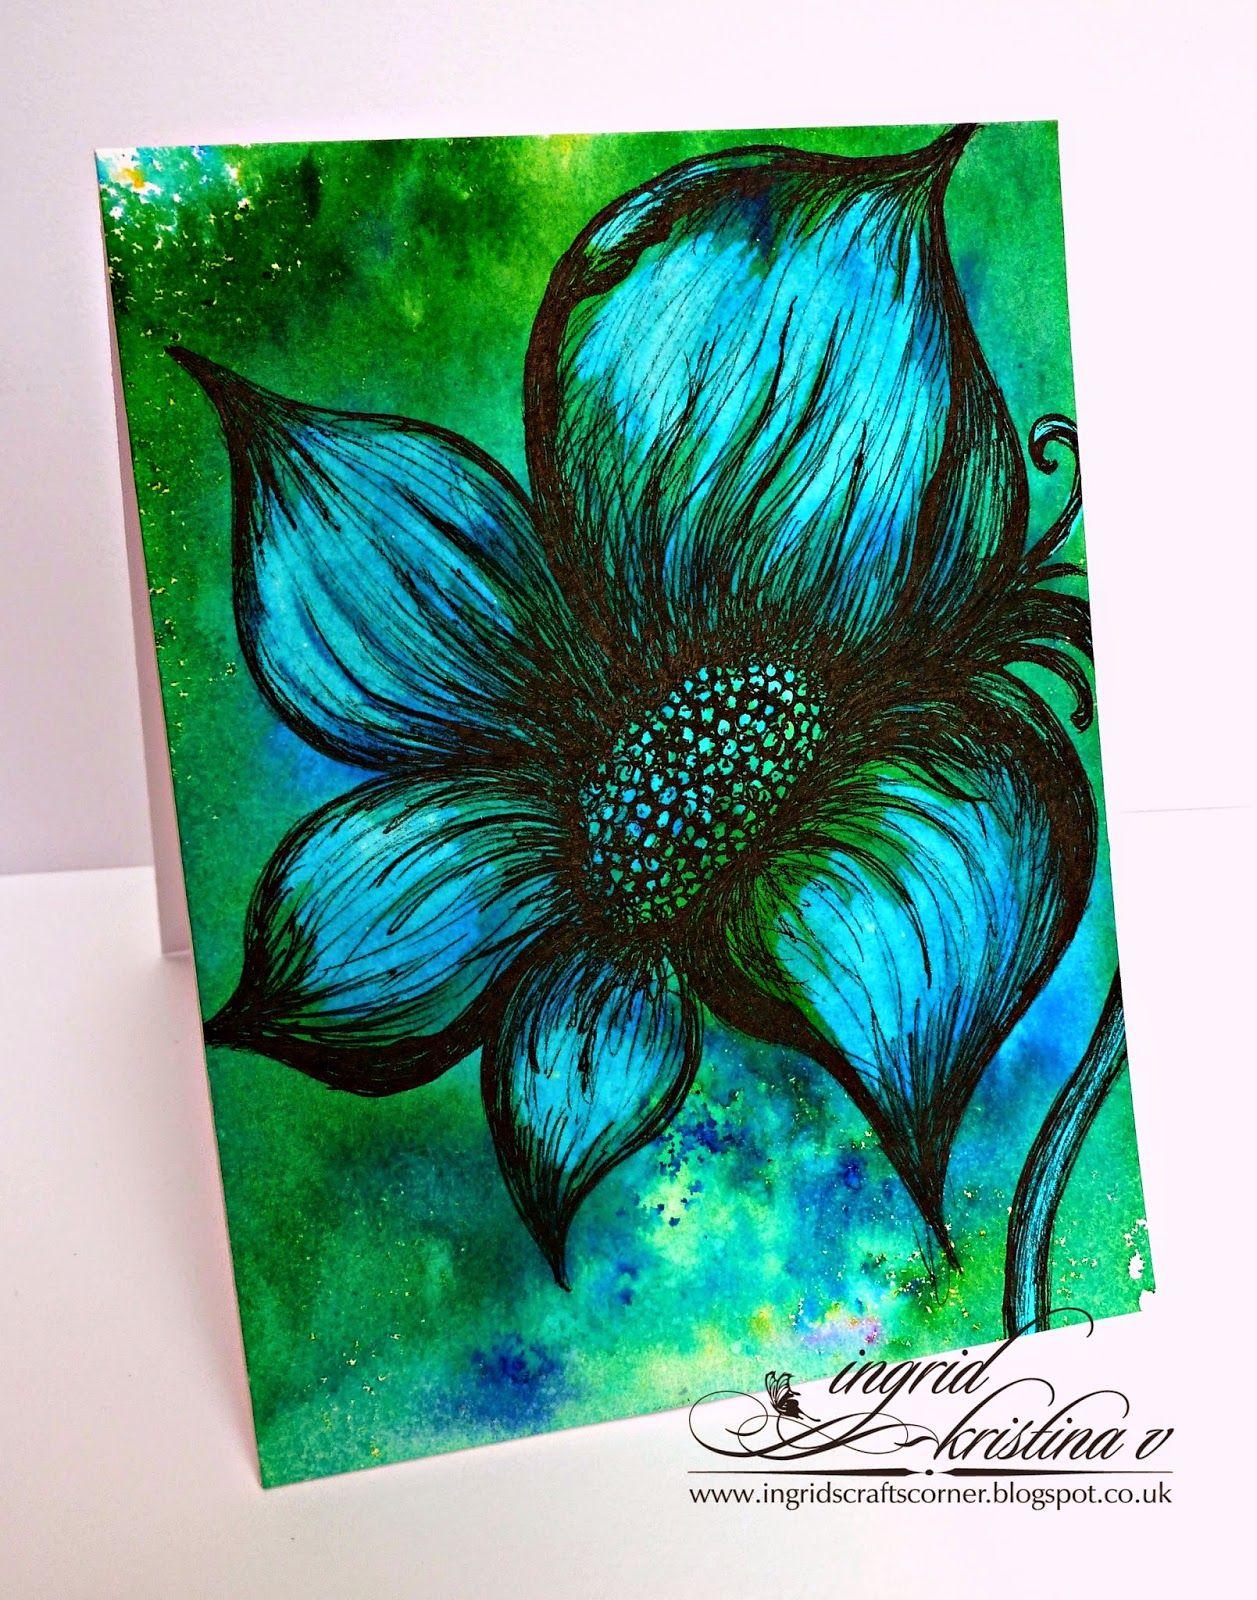 Ingrids Crafts Corner Whimsical Flower Card  Brusho Bleaching Technique